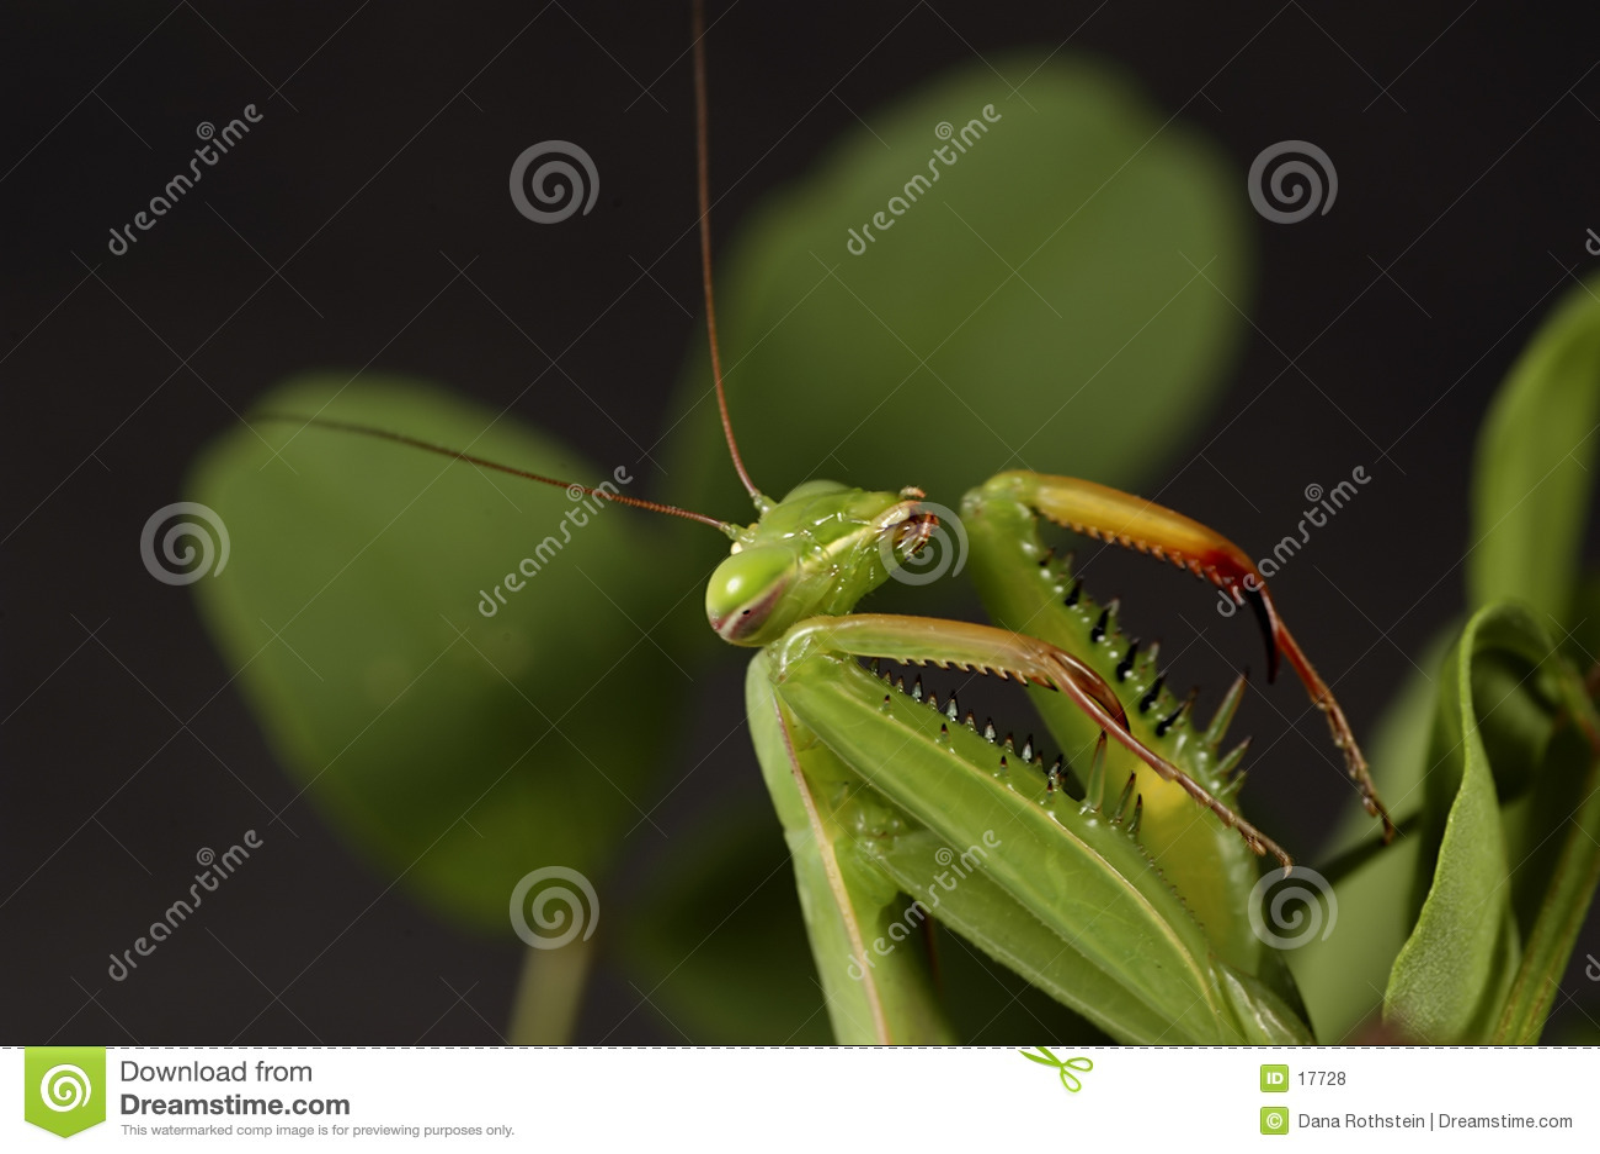 Preying Mantis 3